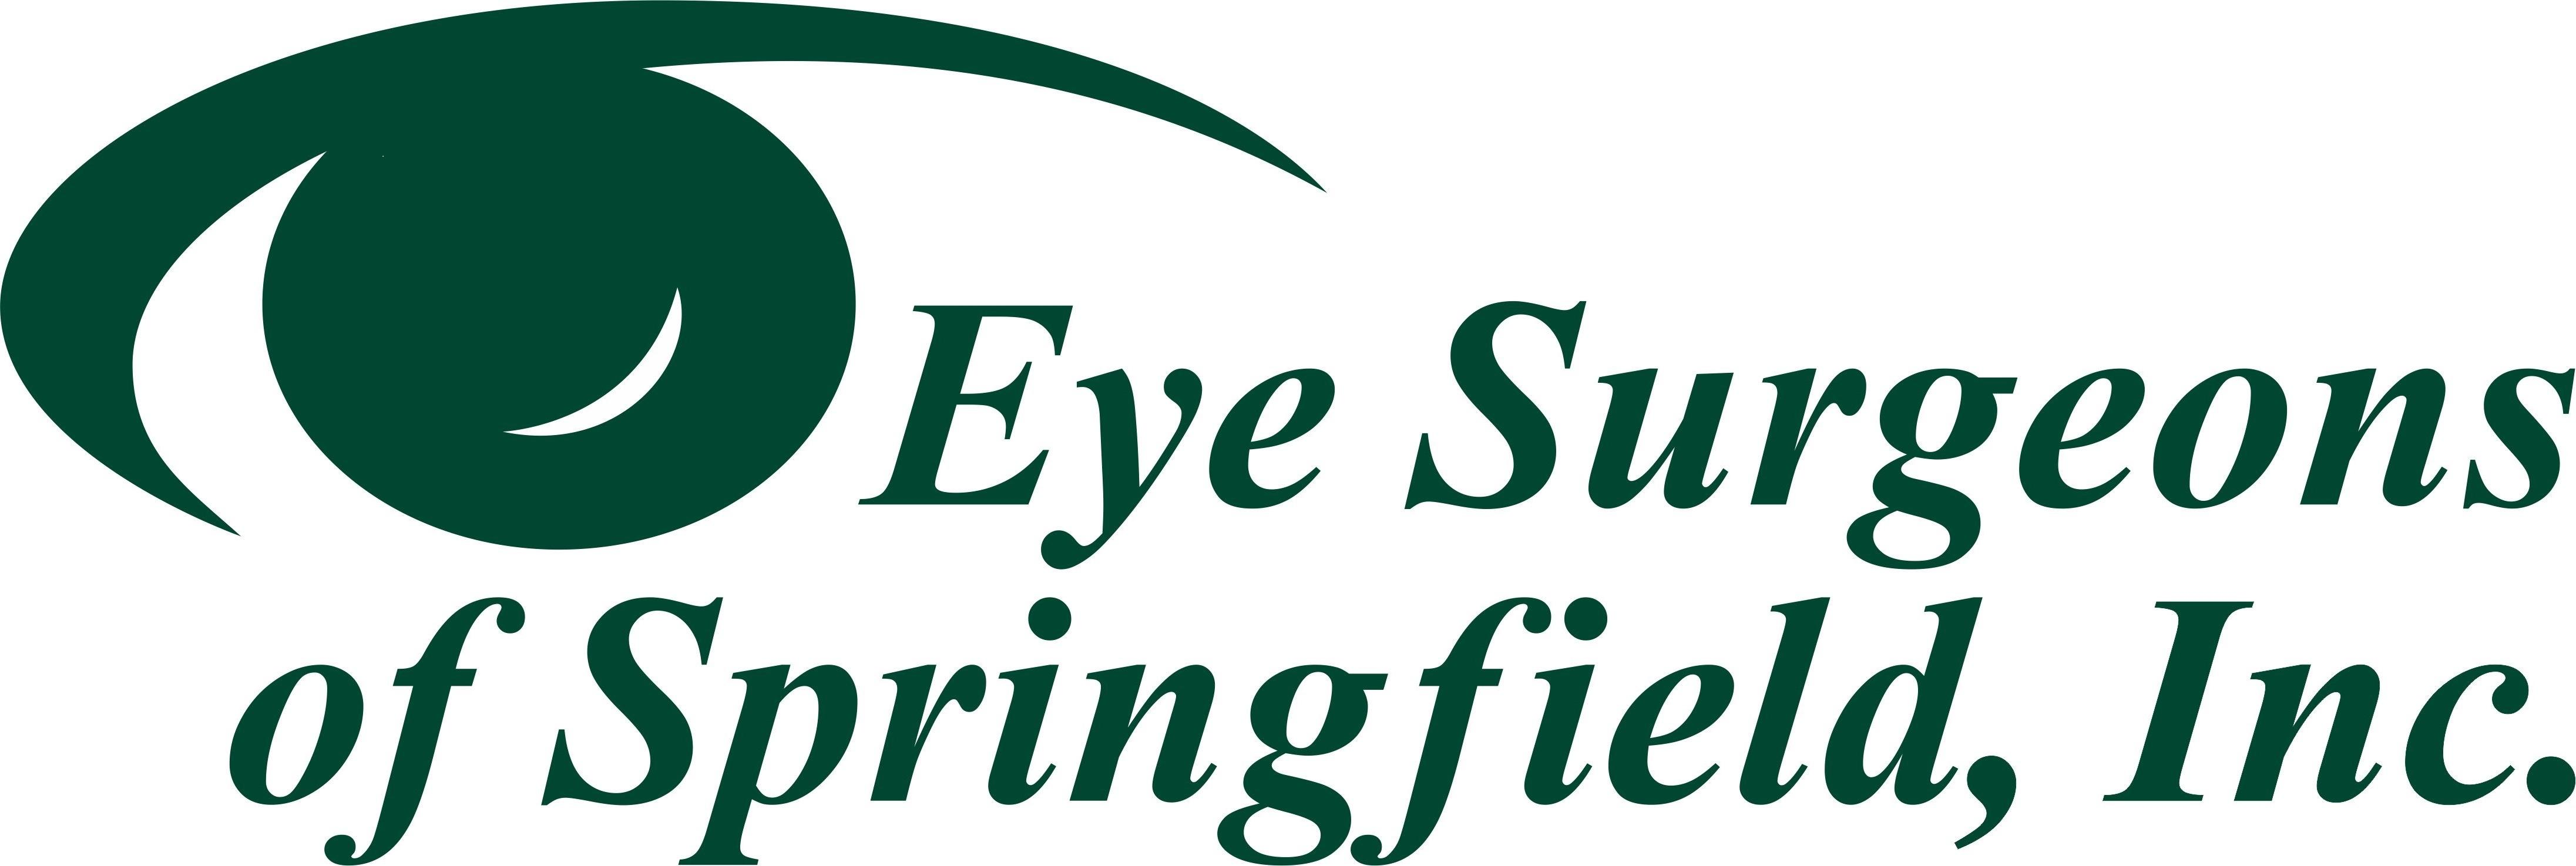 Eye Surgeons of Springfield Inc image 1